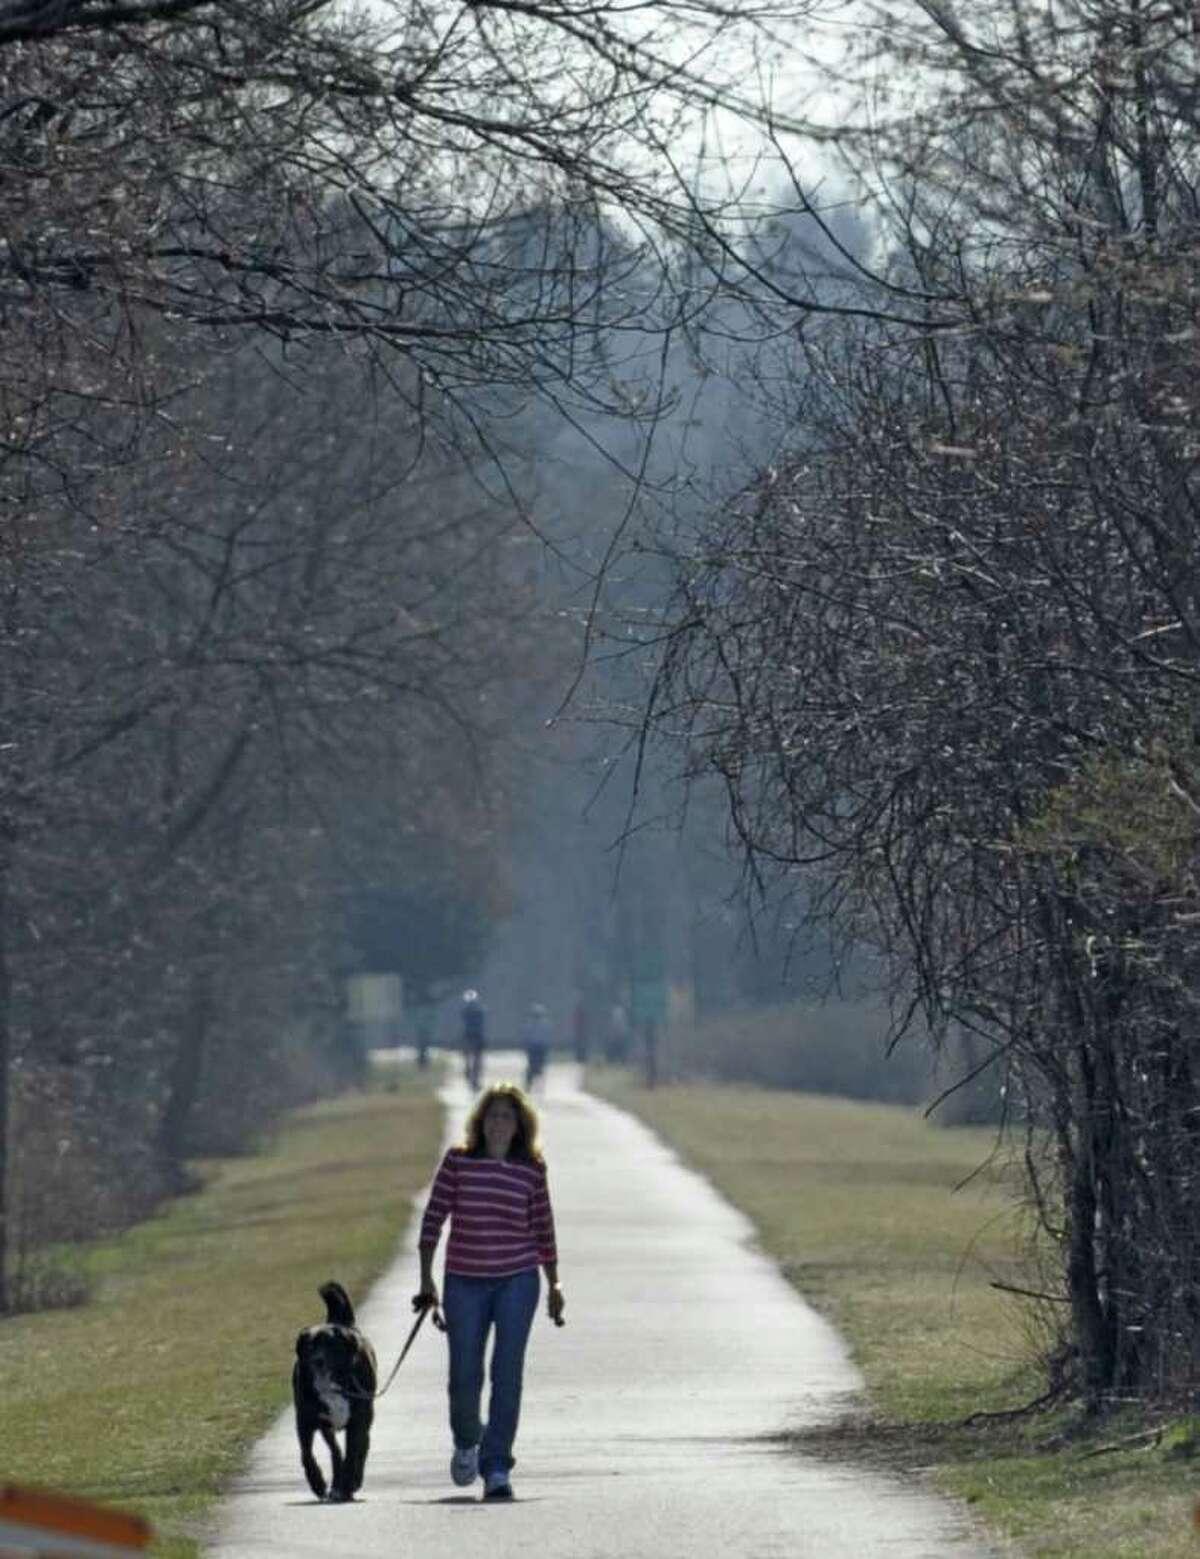 Veterinarian Debbie Snyder takes her dog Sundance for a walk on the bike path near Lions Park in Niskayuna, N.Y. March 20, 2012. (Skip Dickstein/Times Union)